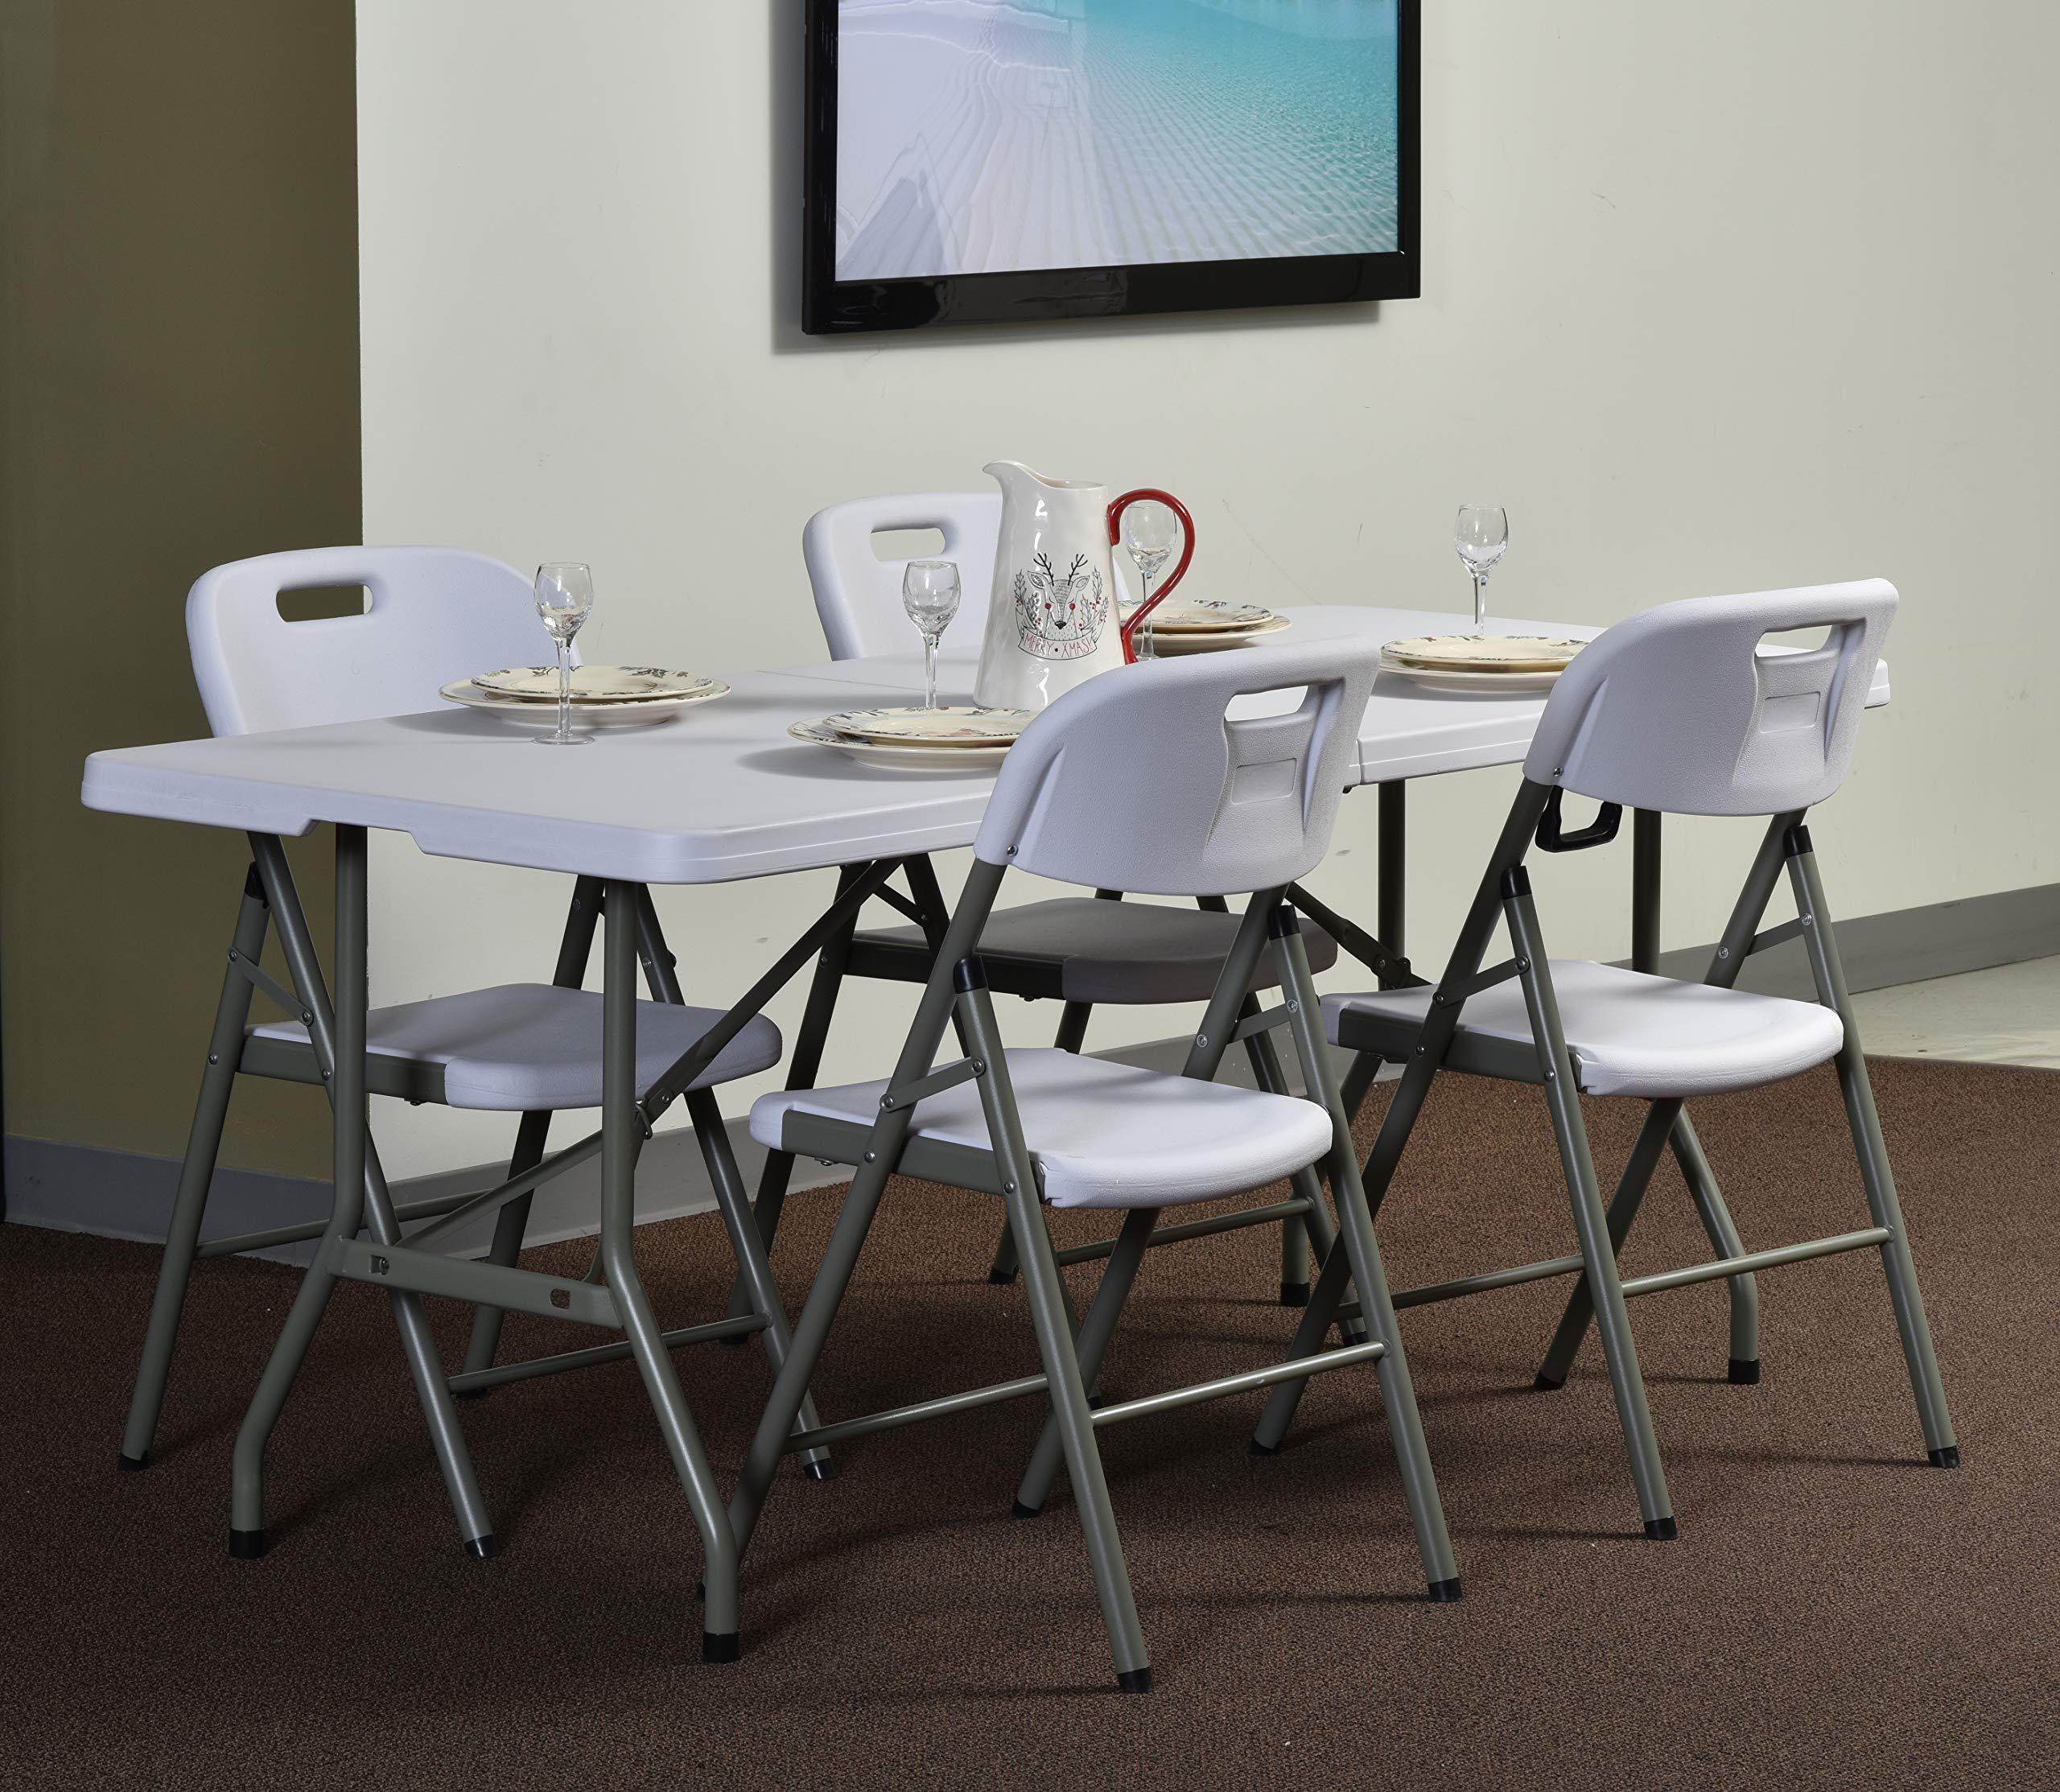 Sandusky Lee FPT7230-WV2 Commercial Fold in Half Utility Table, 6', White, 29'' Height, 72'' Width, 30'' Length by Sandusky (Image #5)